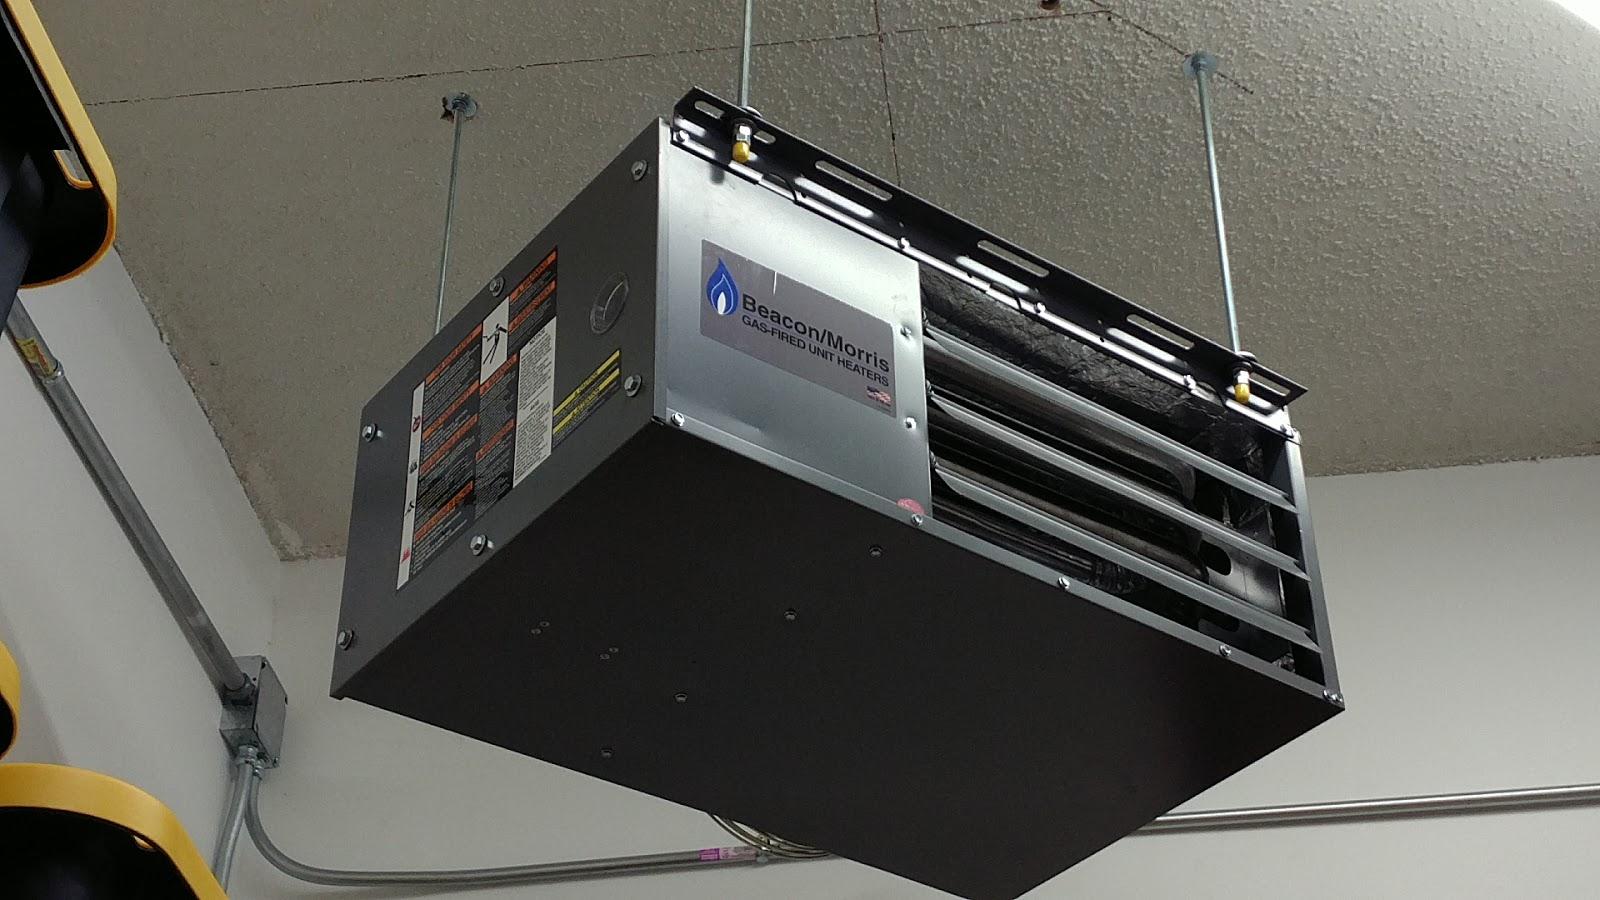 Thedougturner Part 1 Beacon Morris 45k Btu Garage Heater